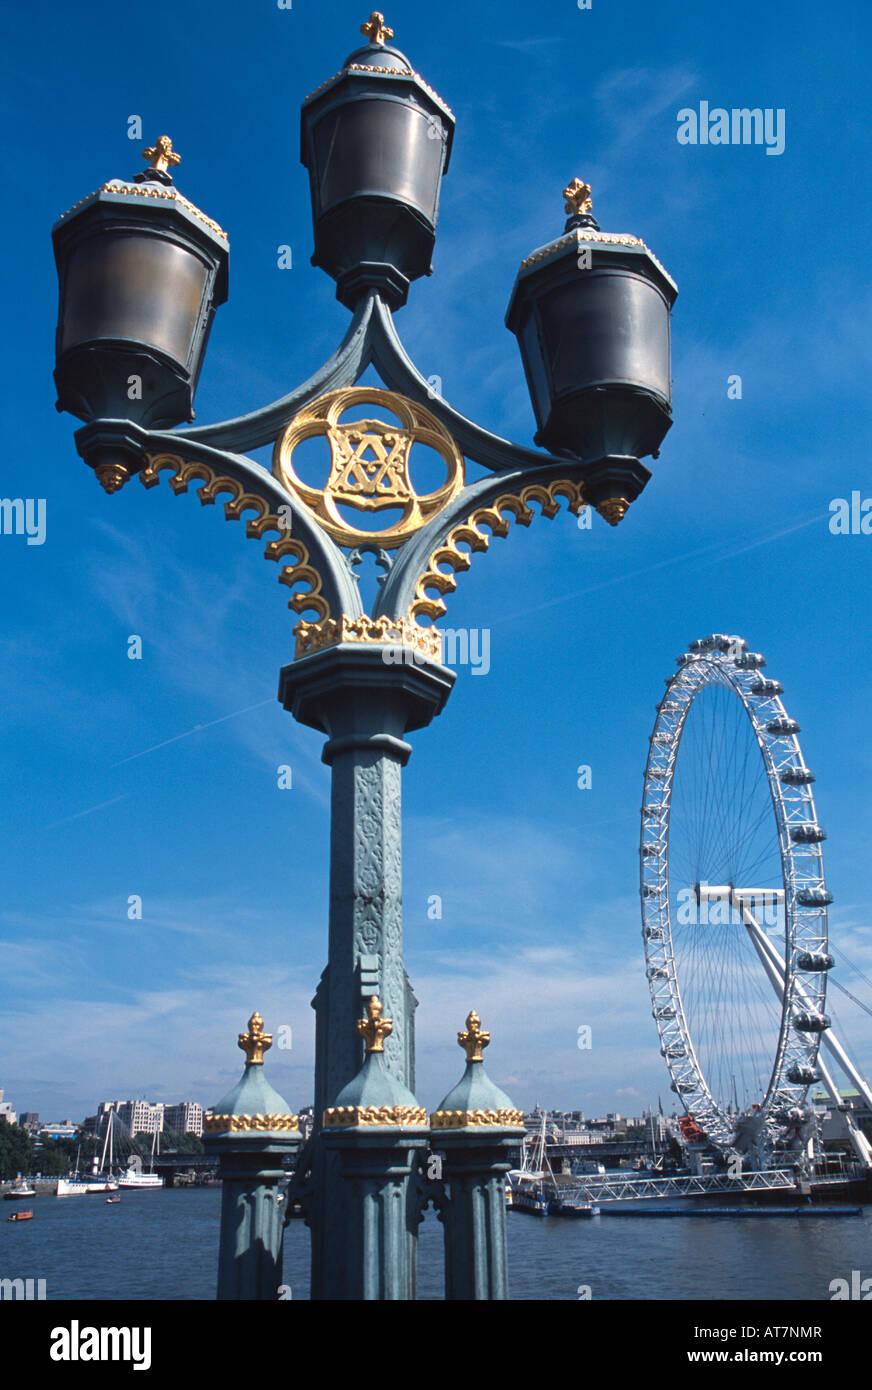 ornate lighting. Westminster Bridge River Thames Ornate Lighting Column Plus British Airways London Eye Beyond England Uk Gb E